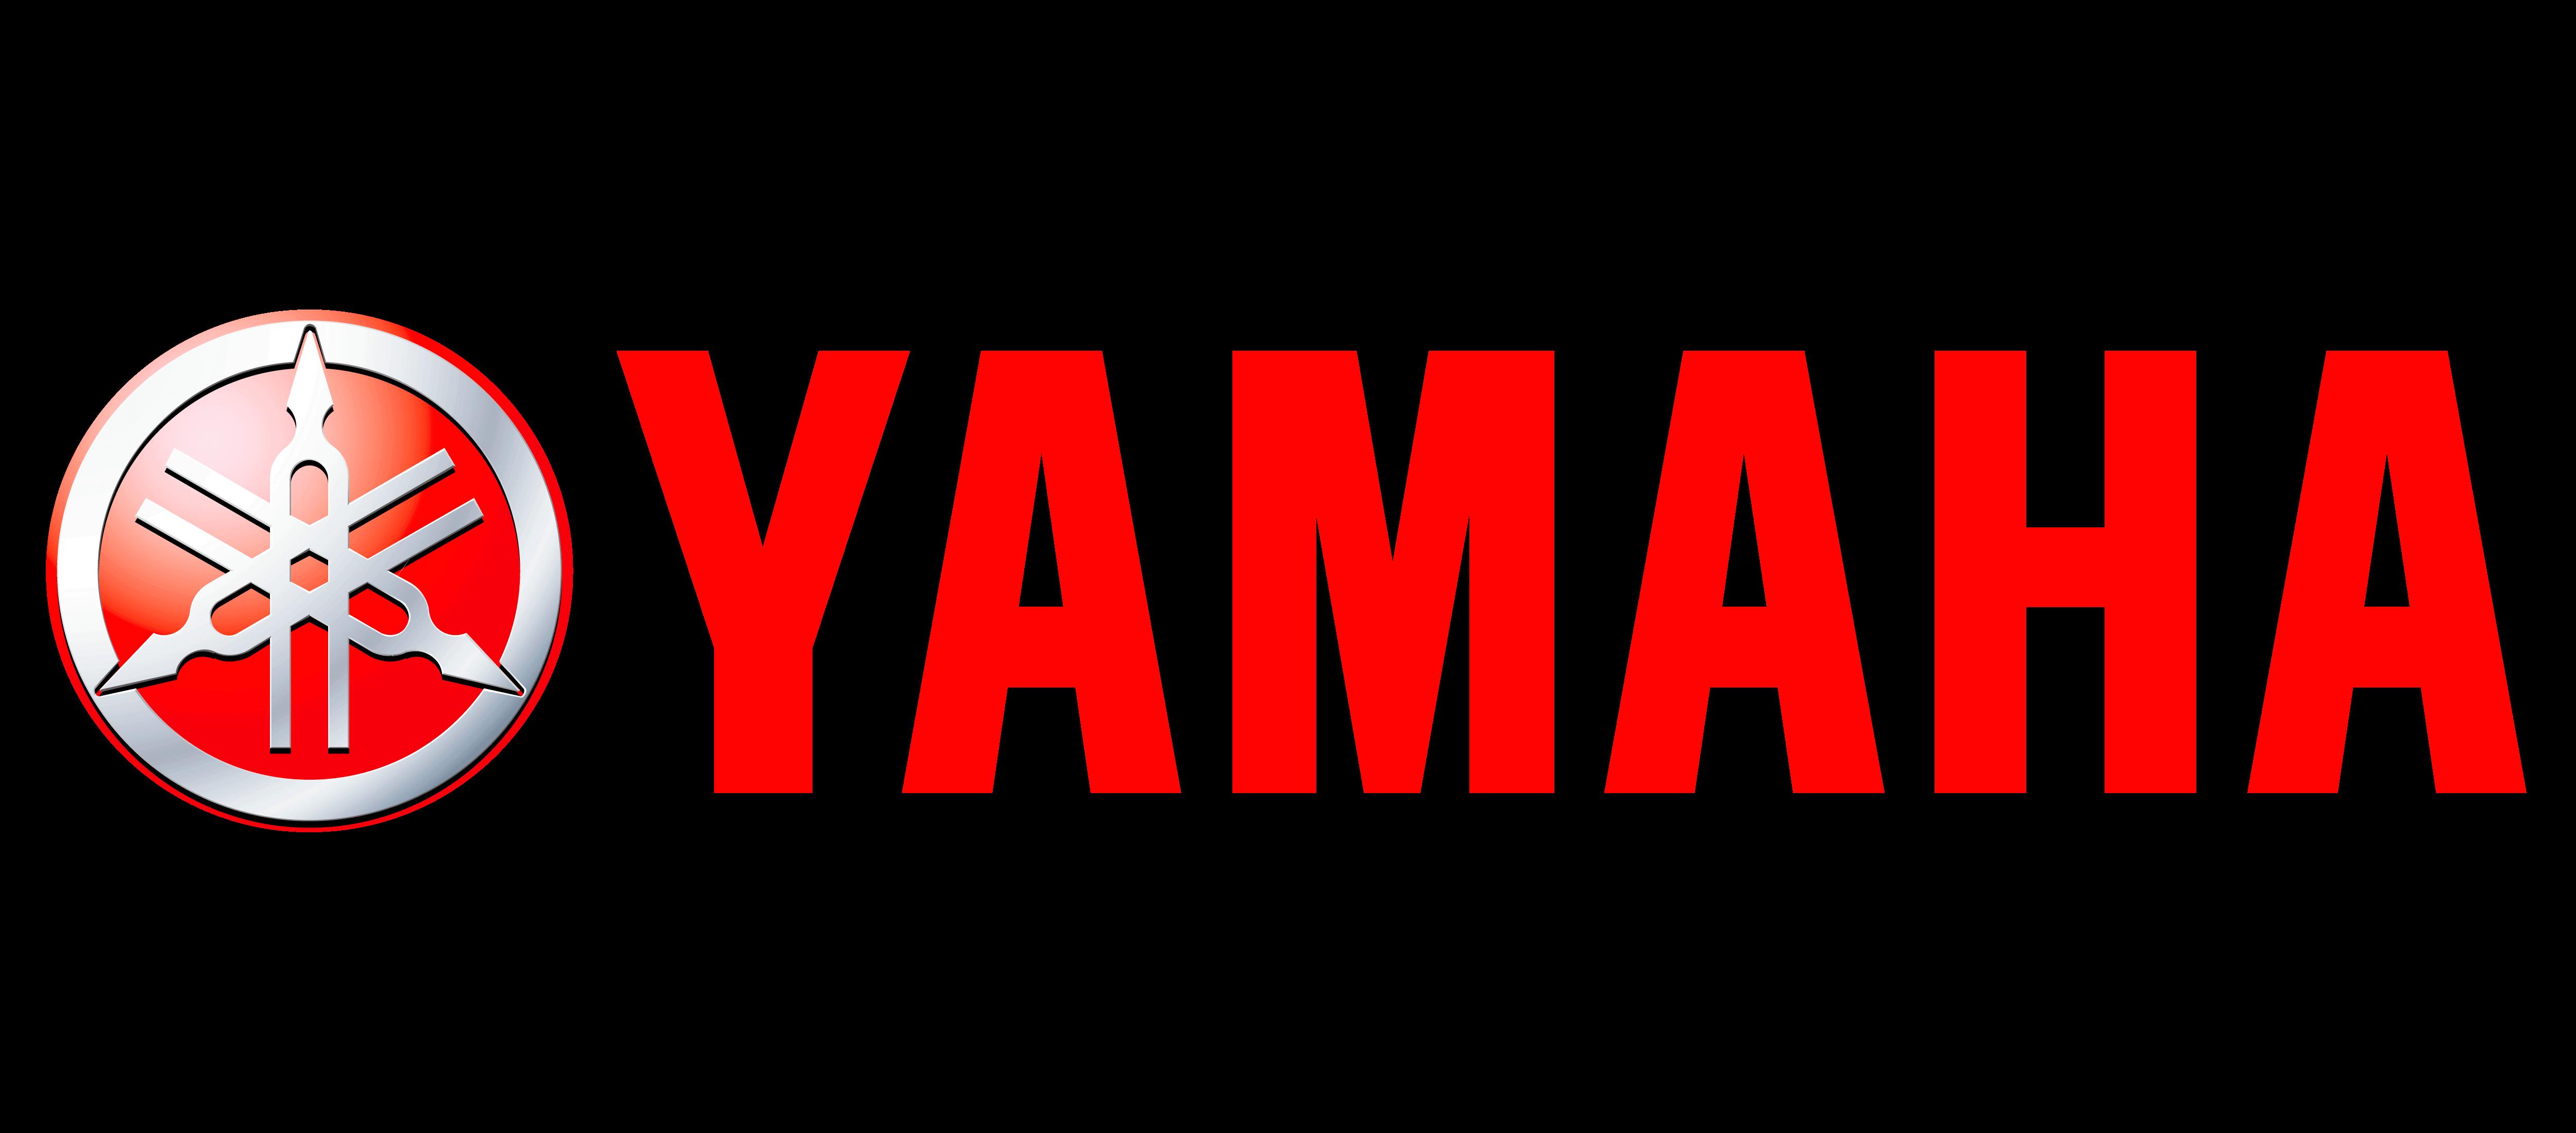 Information About The Company Yamaha - Yamaha PNG